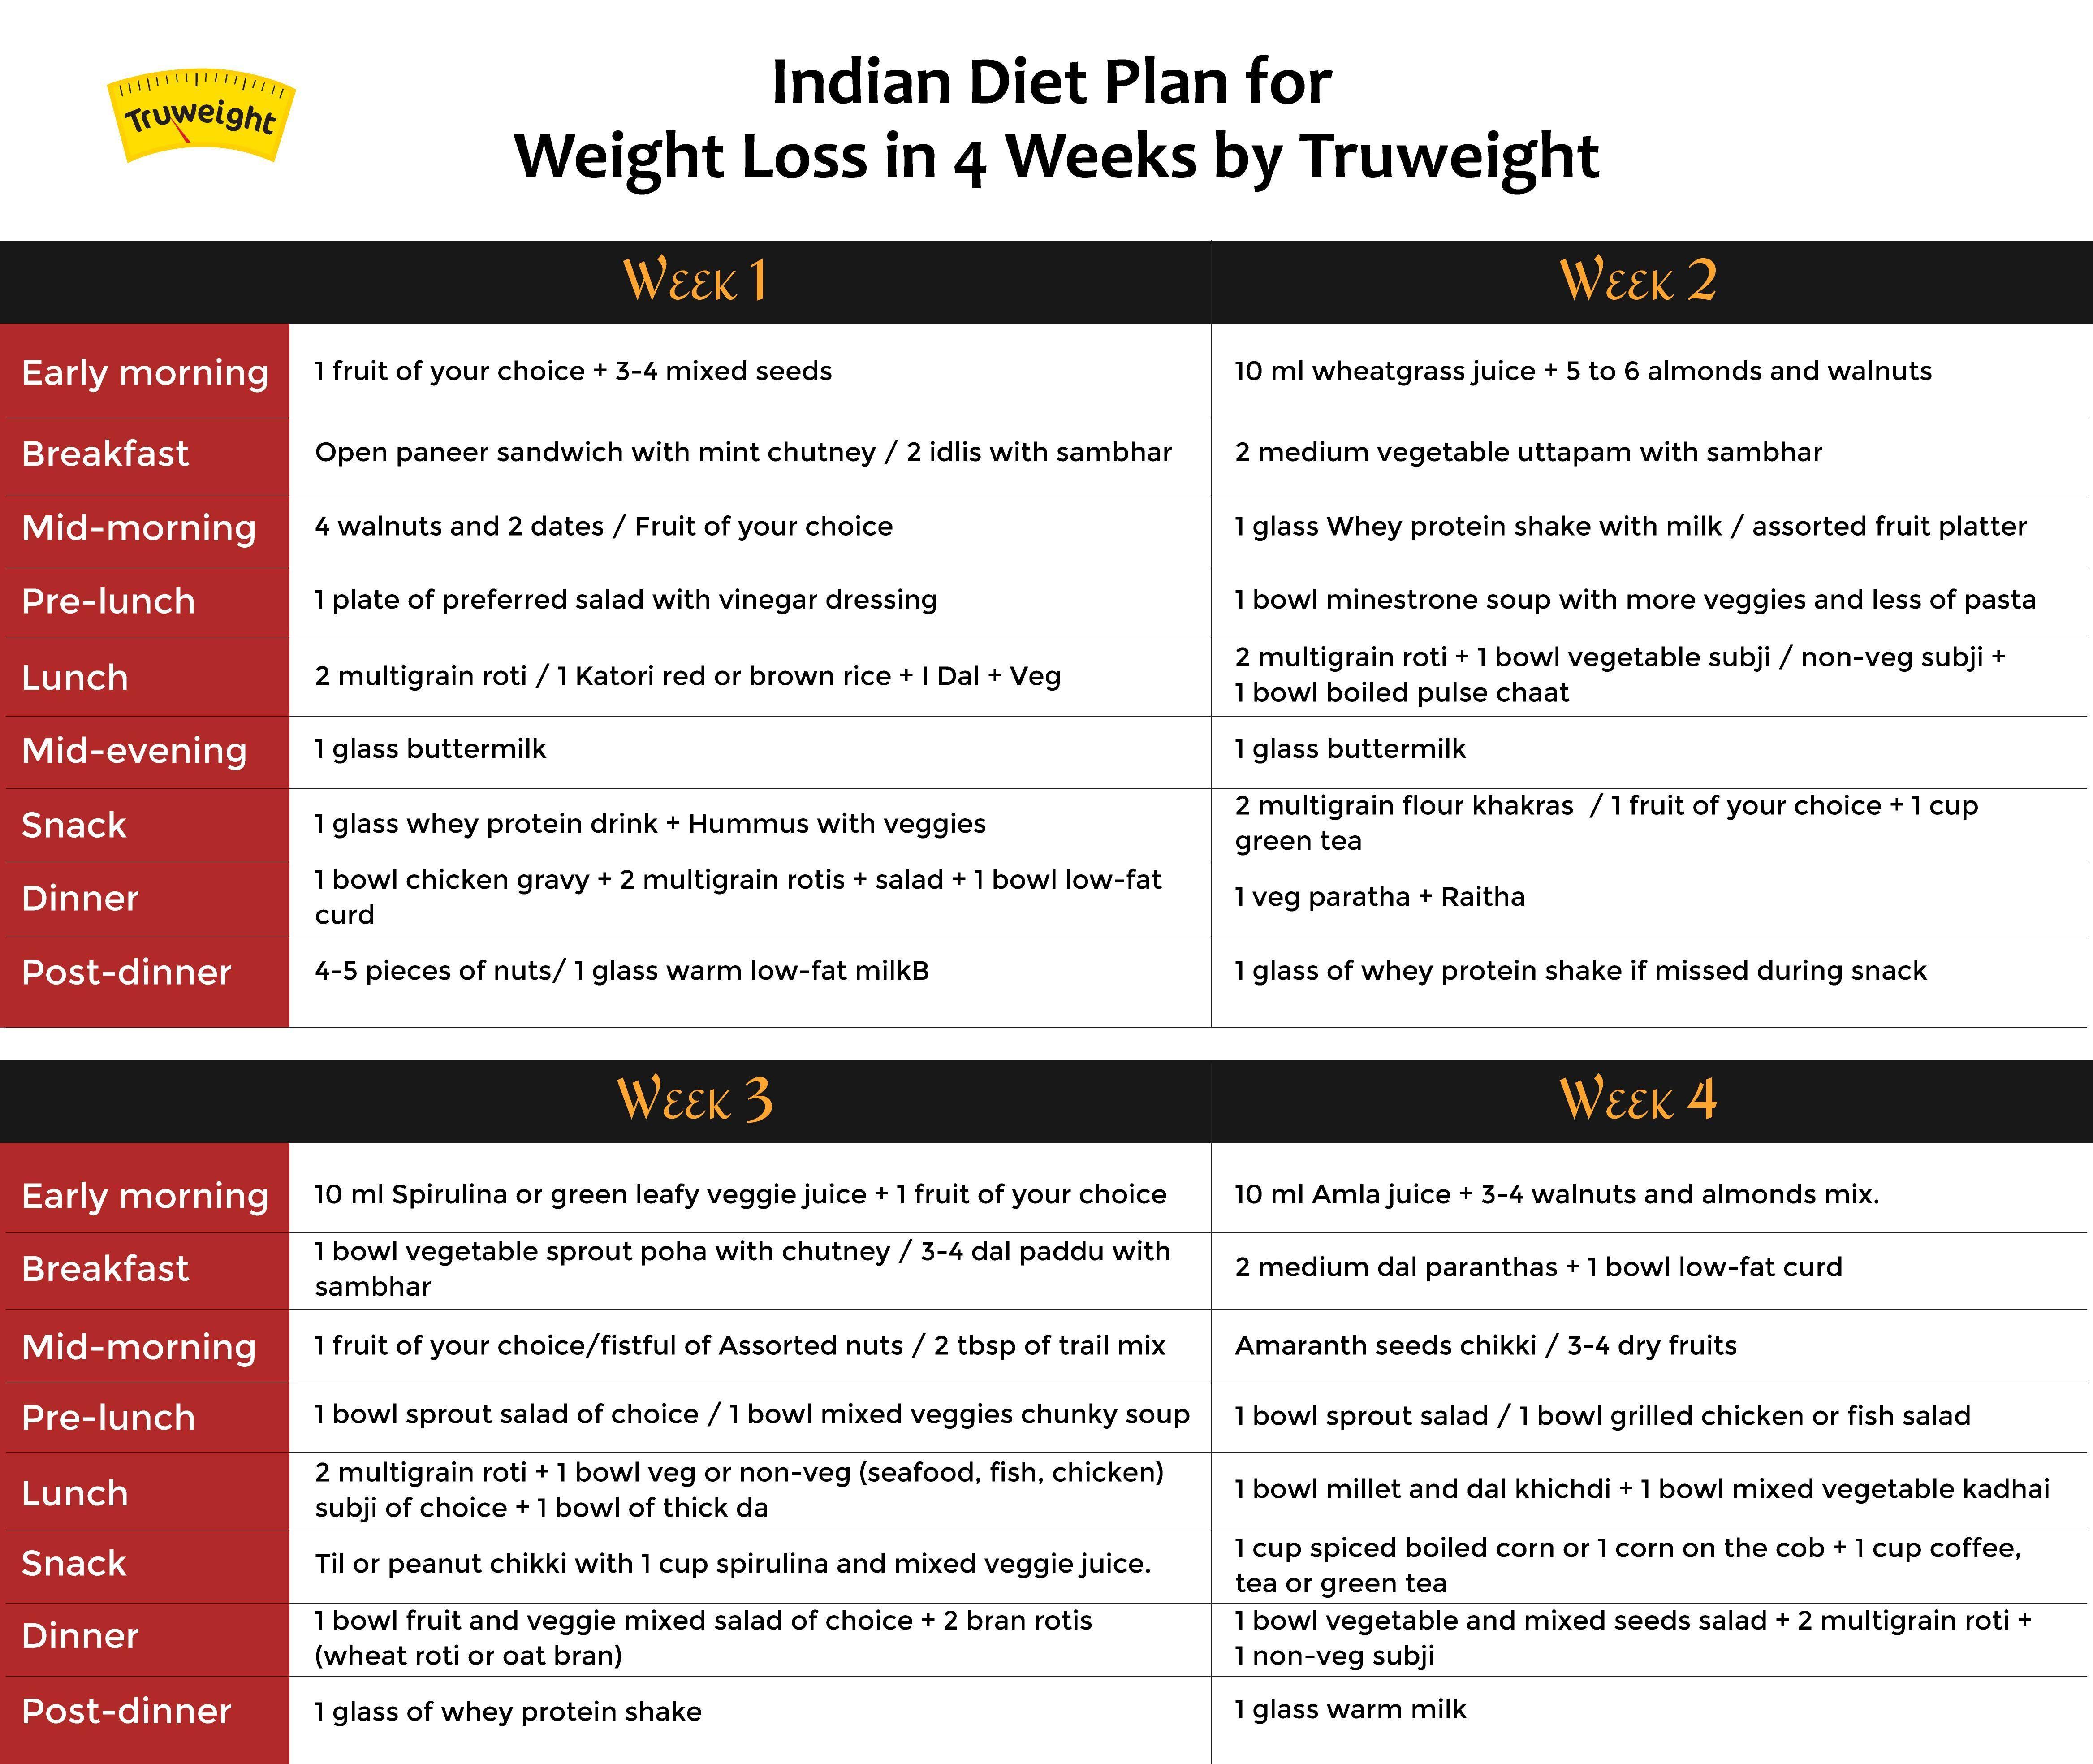 IndianDietPlanForEJpg   Diet Plan